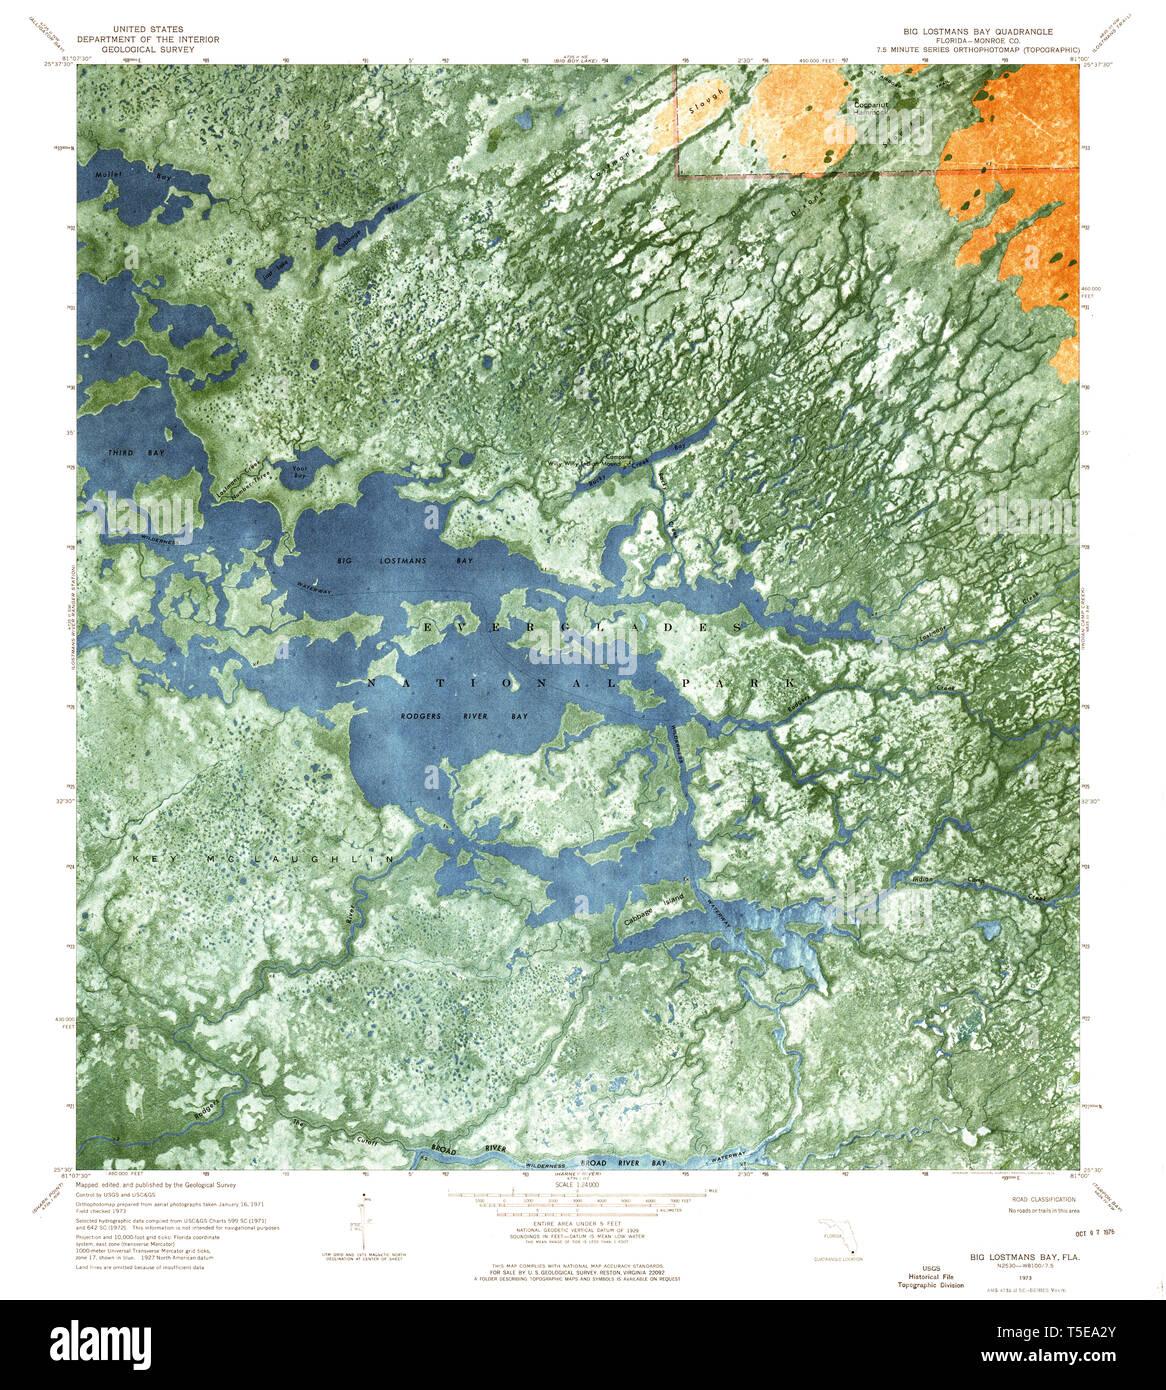 Big Map Of Florida.Usgs Topo Map Florida Fl Big Lostmans Bay 345199 1973 24000